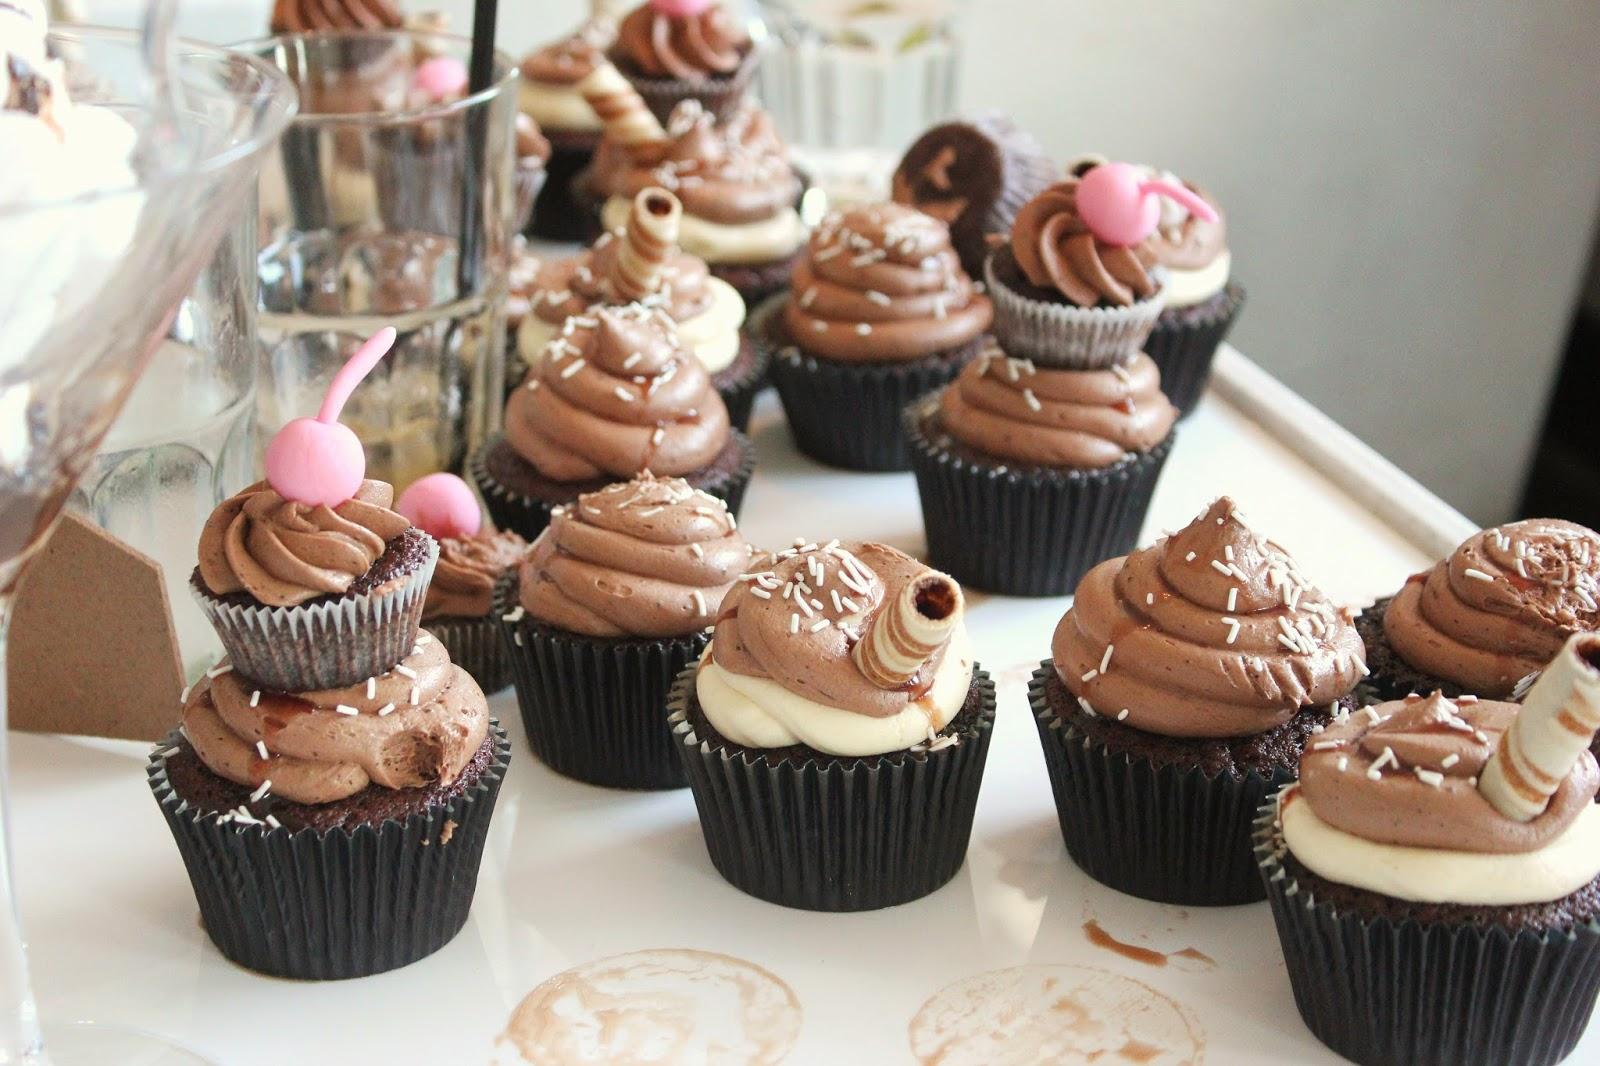 bloggers-love-fashion-week-food-cupcakes